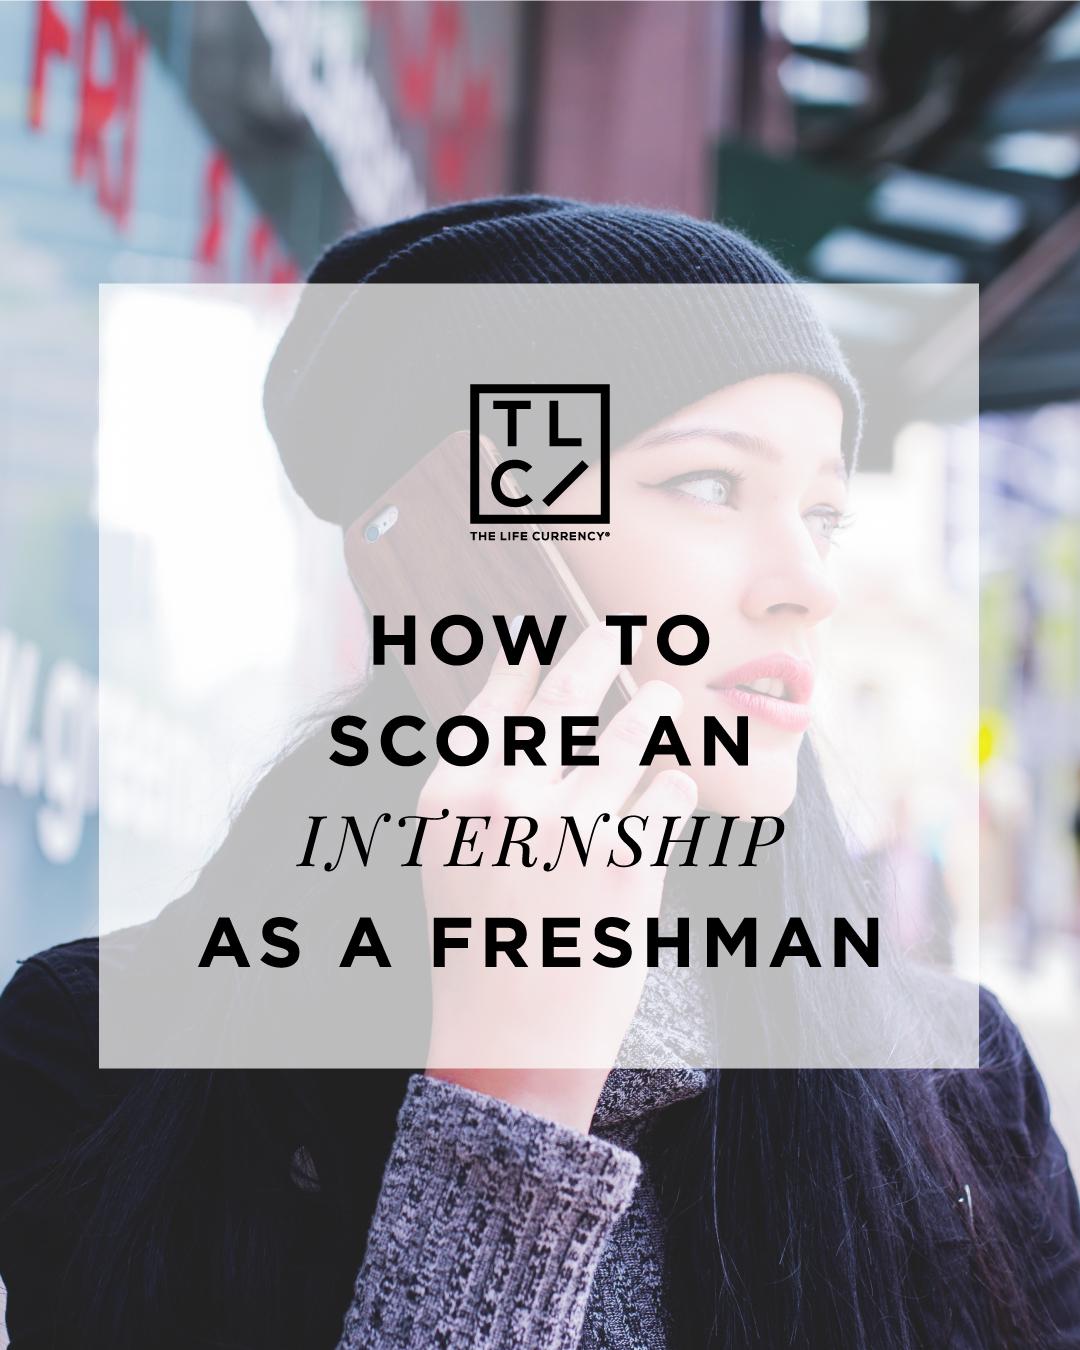 7 Ways to Score an Internship as a Freshman